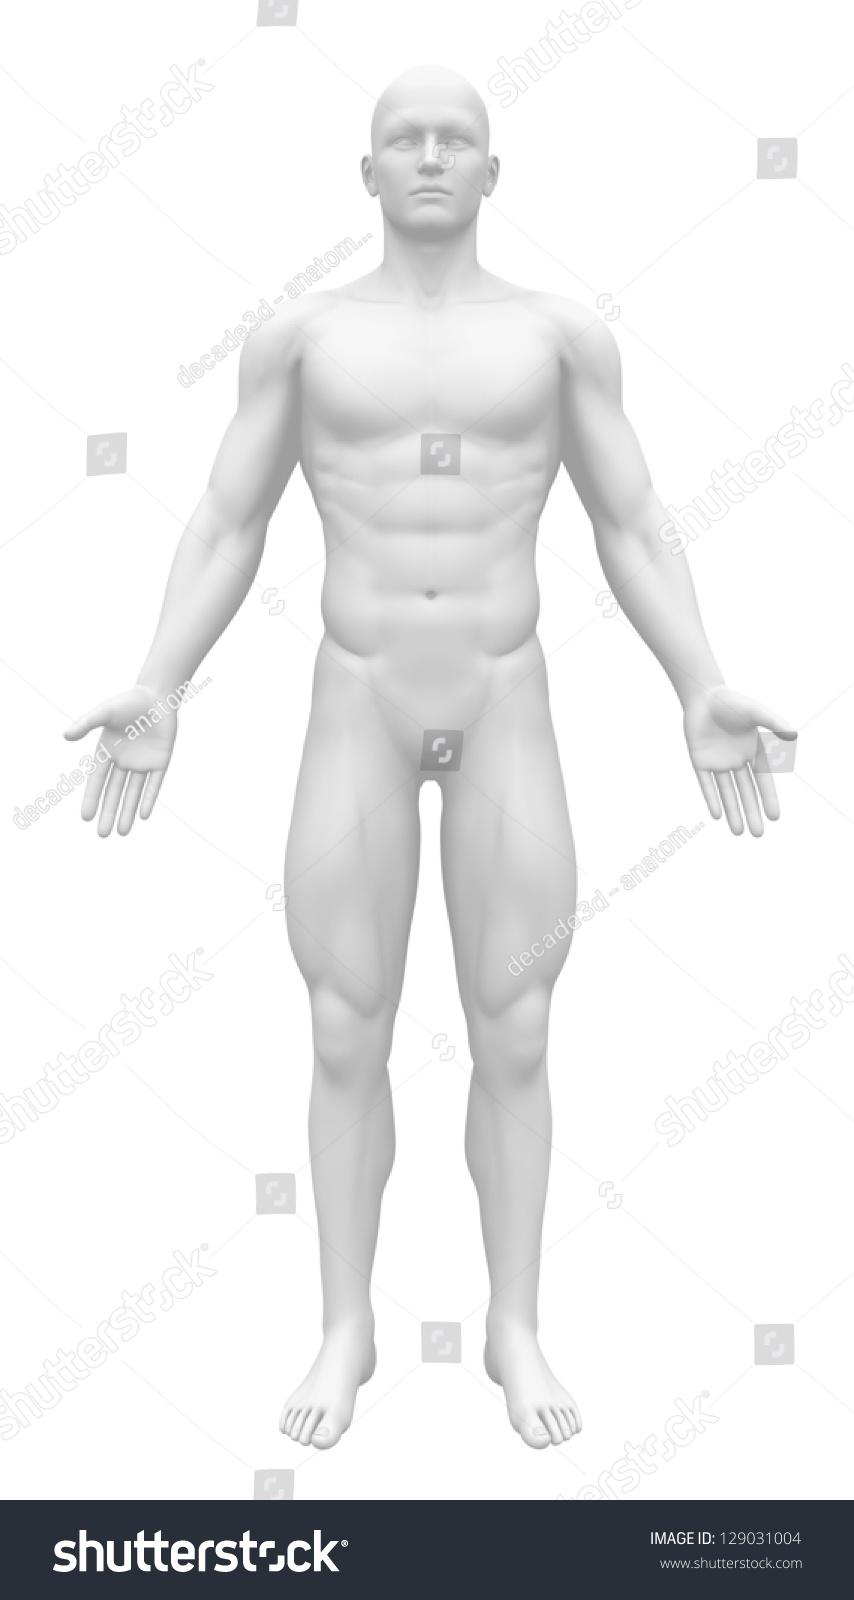 Blank Anatomy Figure White Male Body Stockillustration 129031004